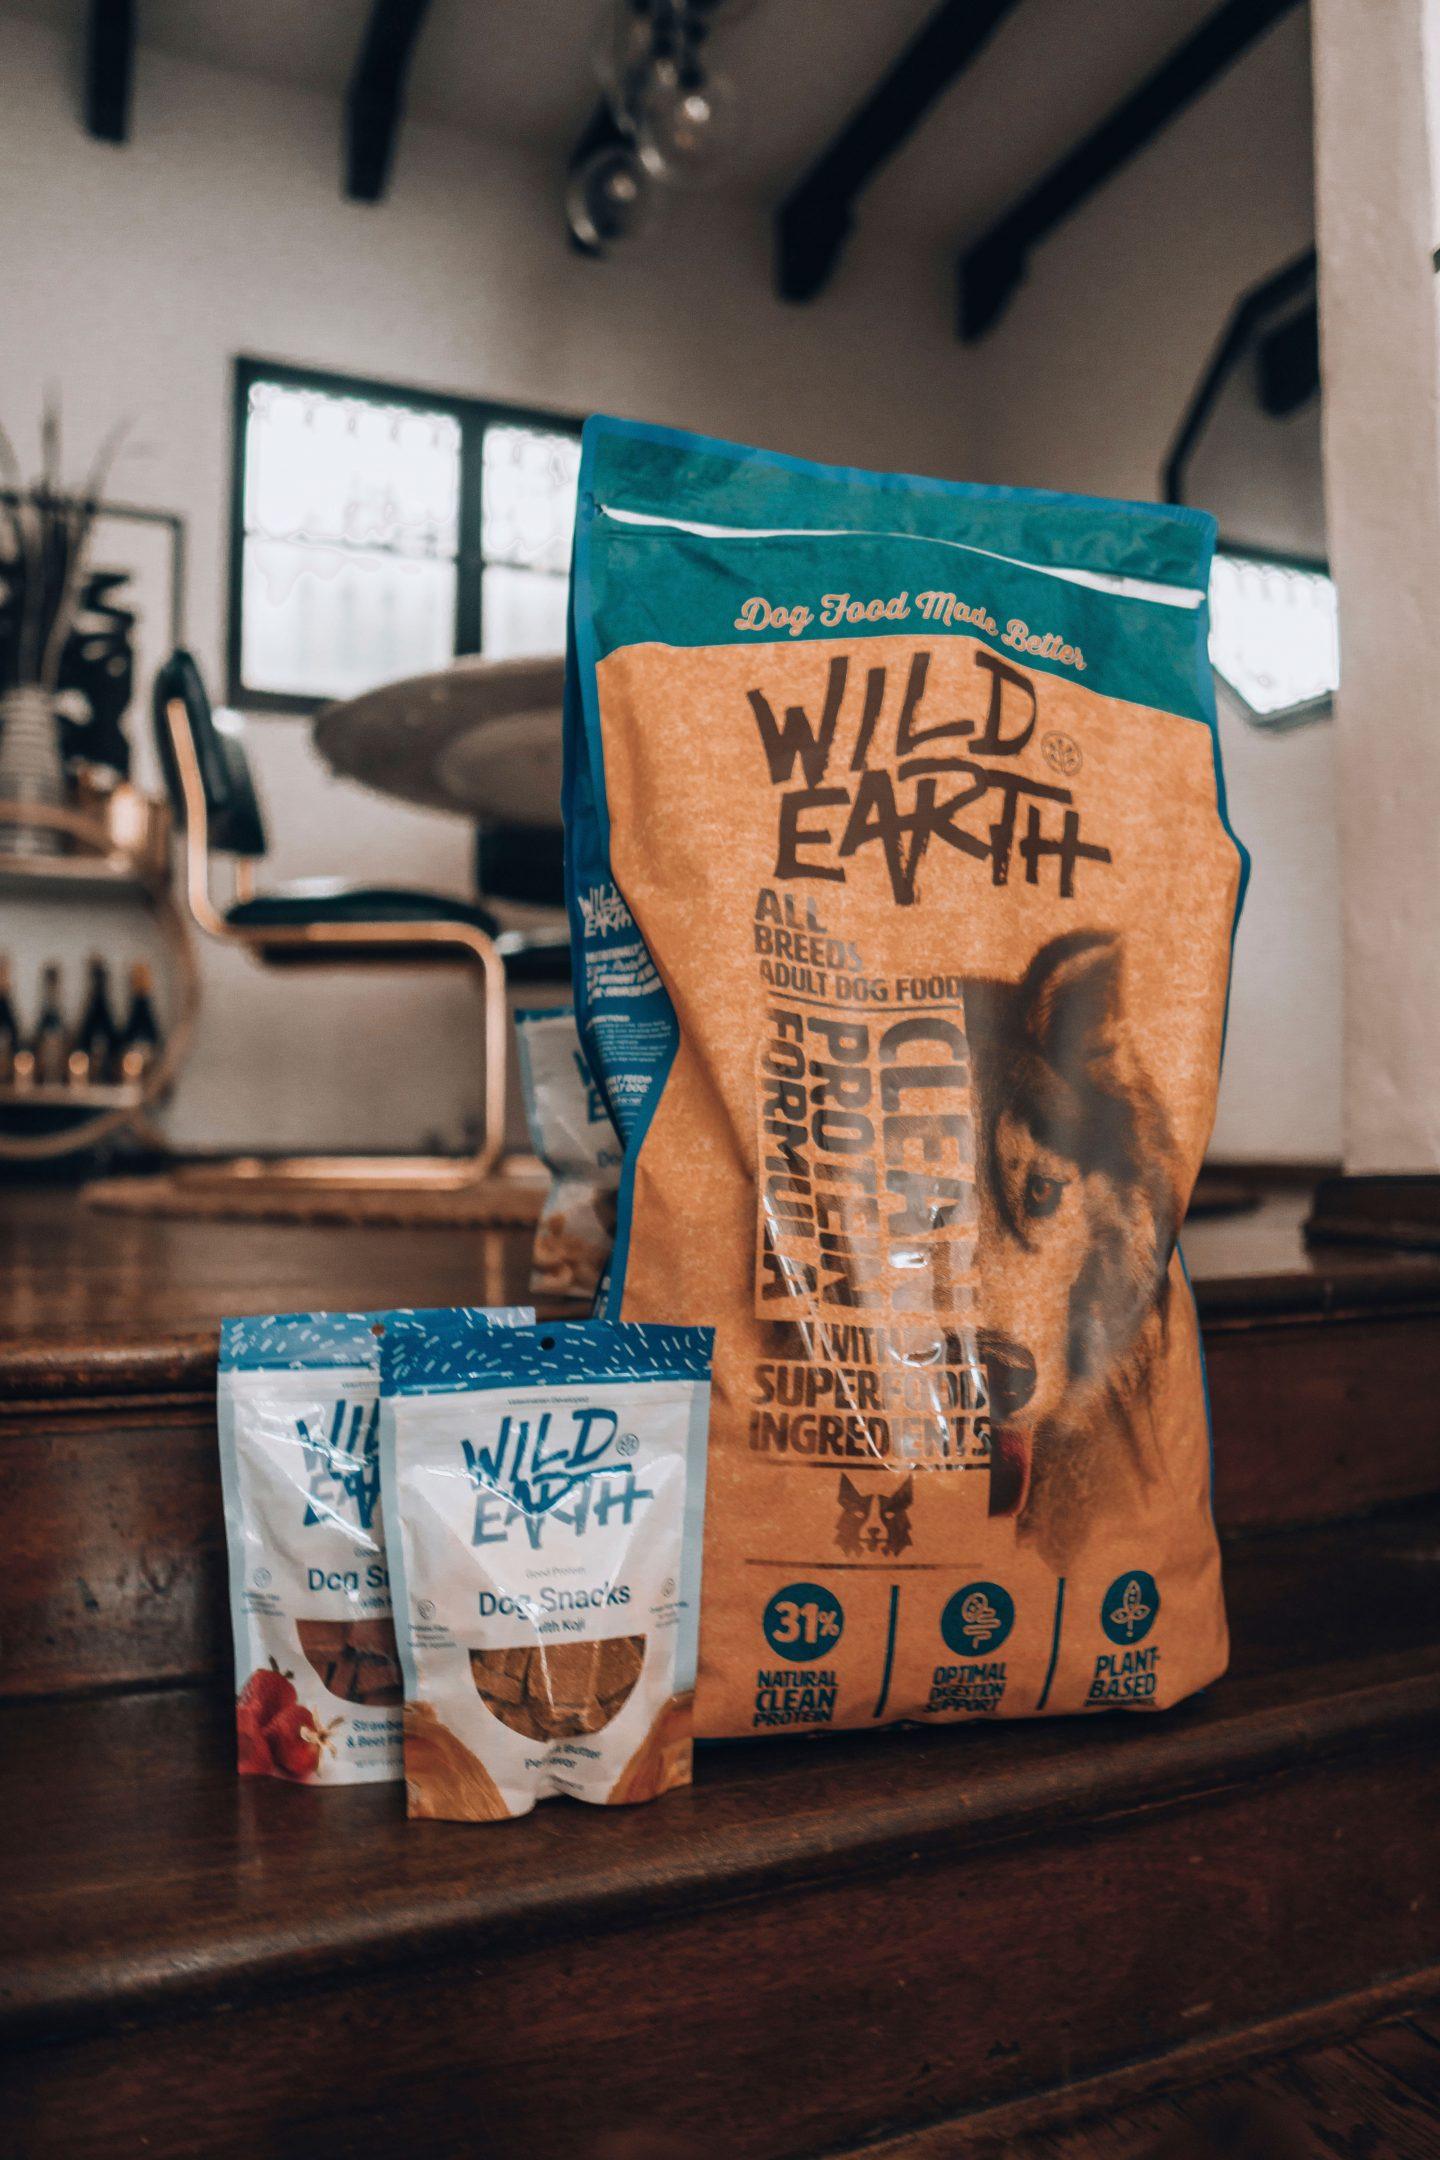 vegan dog food, vegan dogs, wild earth, can dogs be vegan